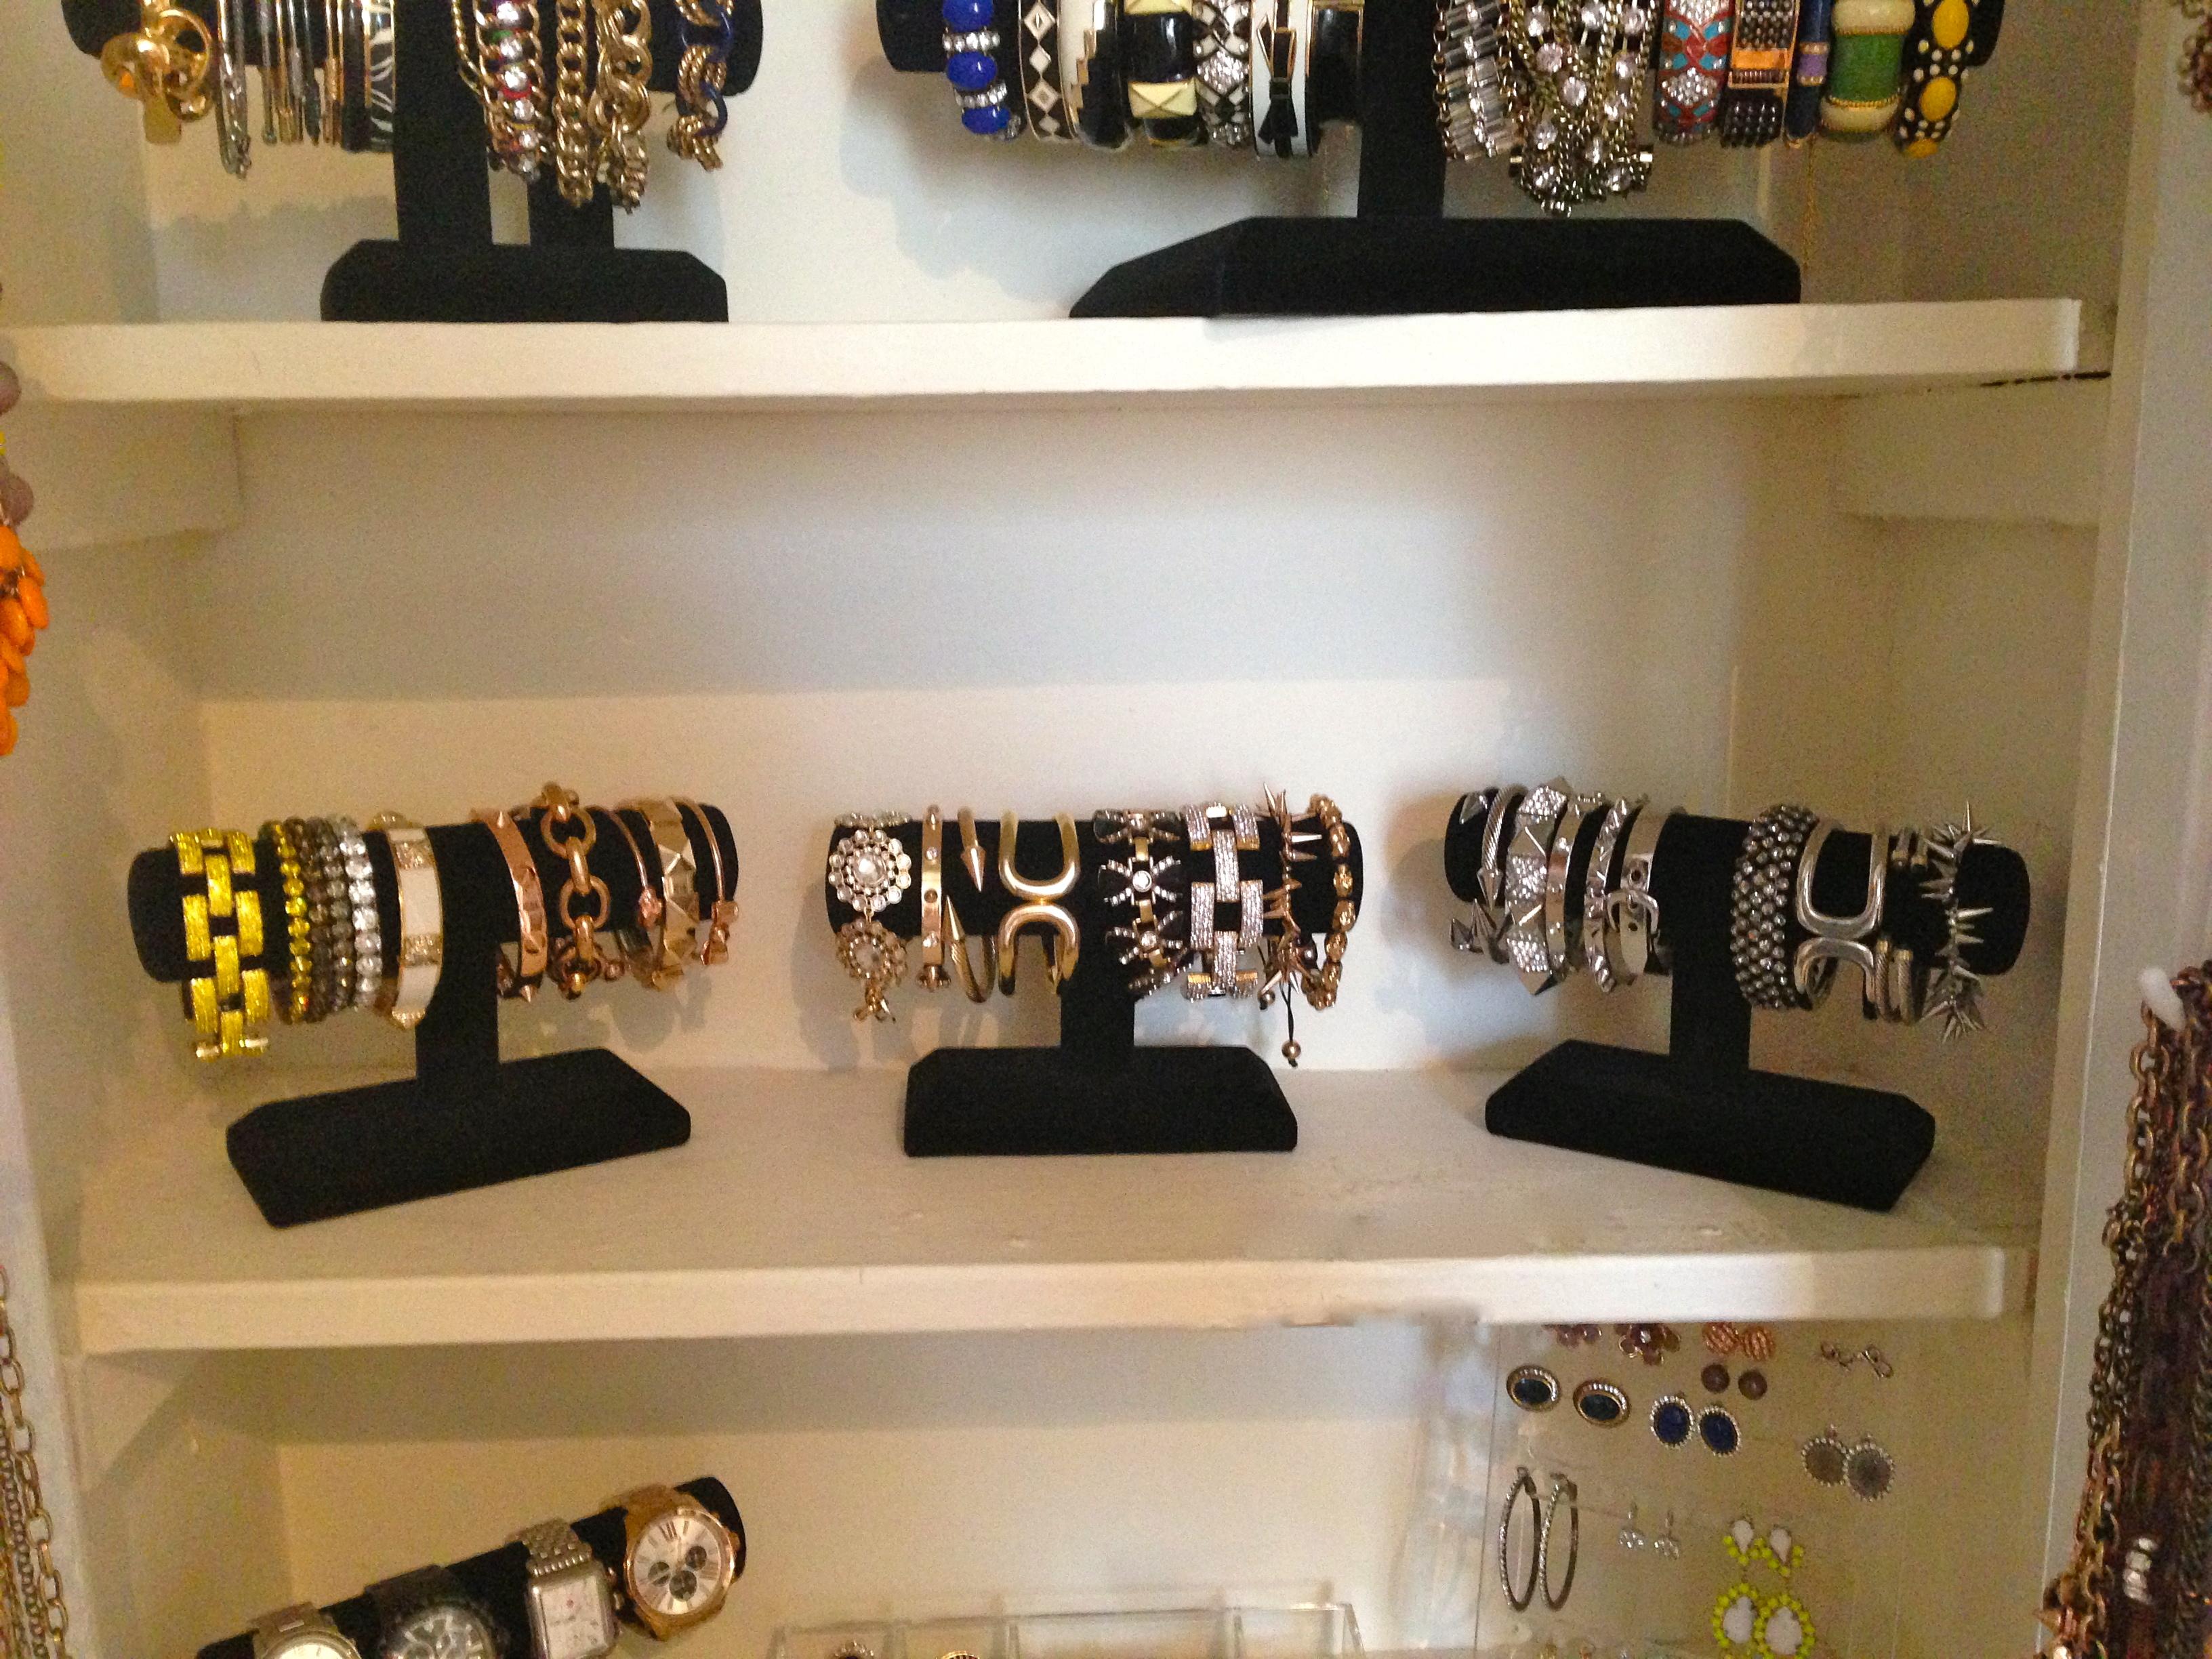 up vanity closets home organizer drawer systems make alex walmart closet jewelry my cheap ikea drawers ideas acrylic of